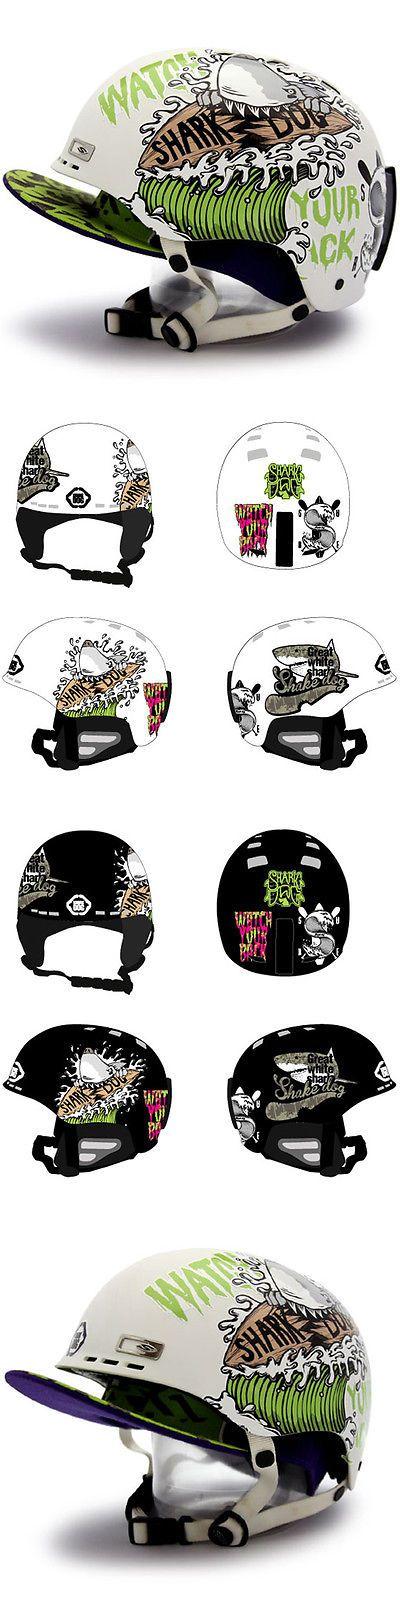 Pinterestteki Den Fazla En Iyi Motorcycle Helmet Decals Fikri - Motorcycle helmet decals and stickers